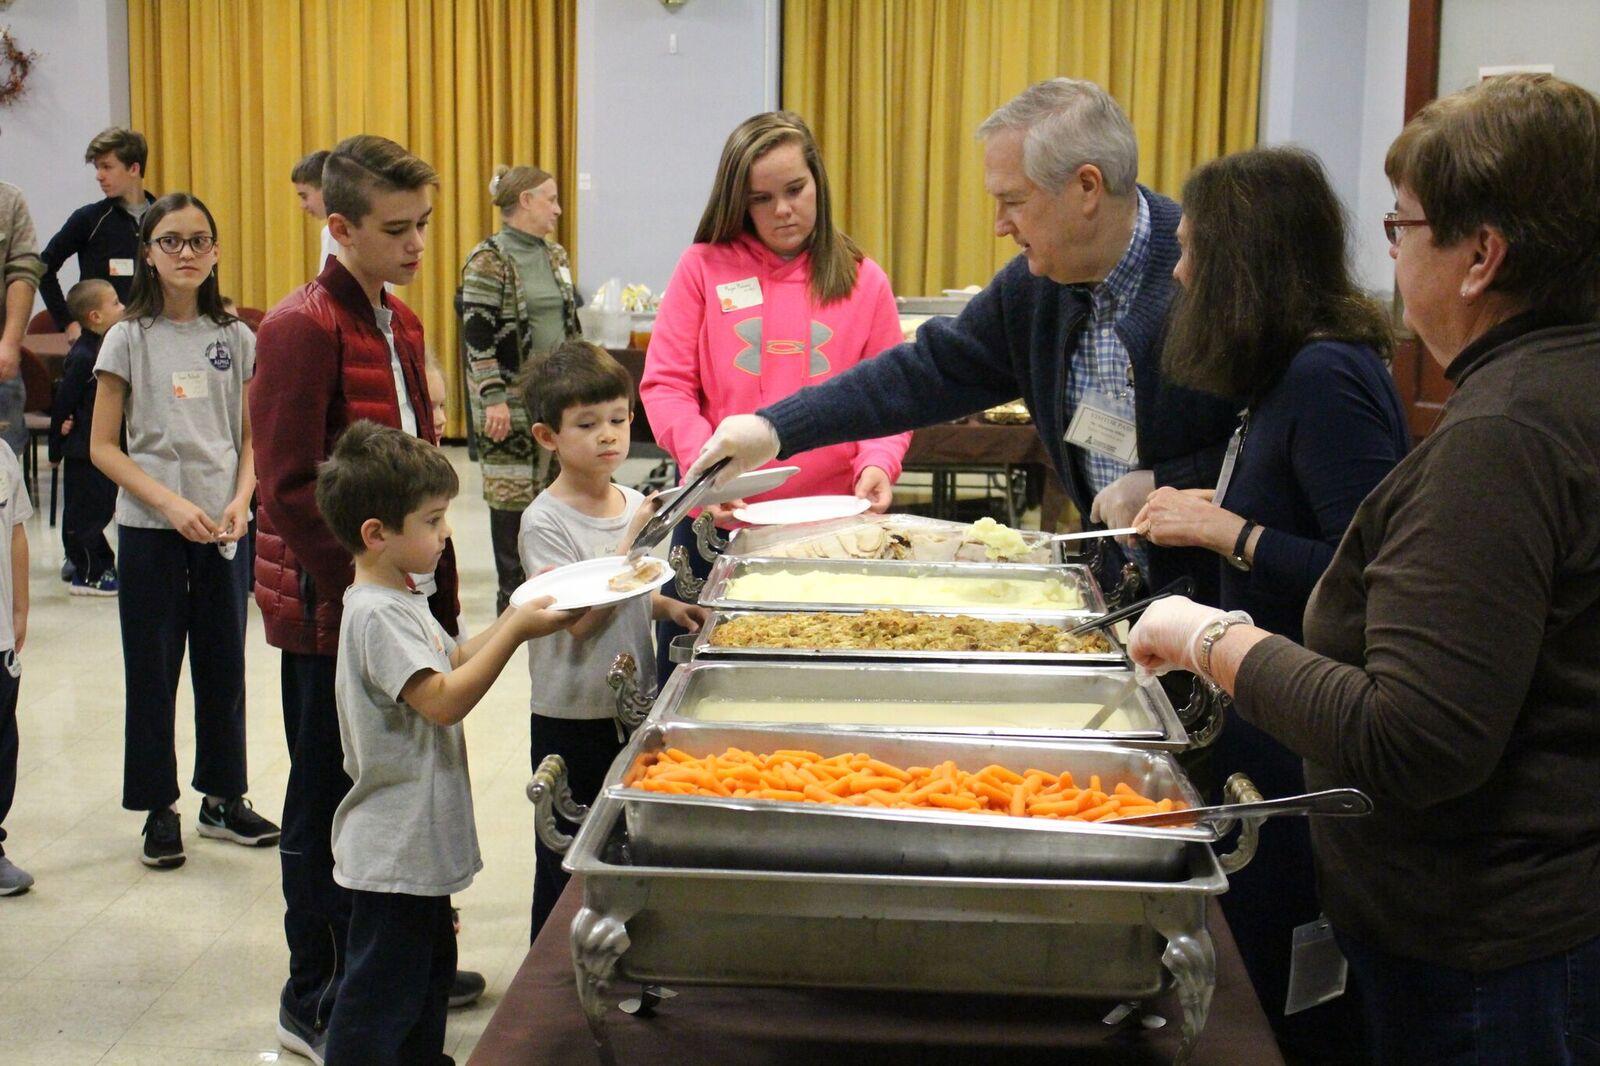 TG feast serving